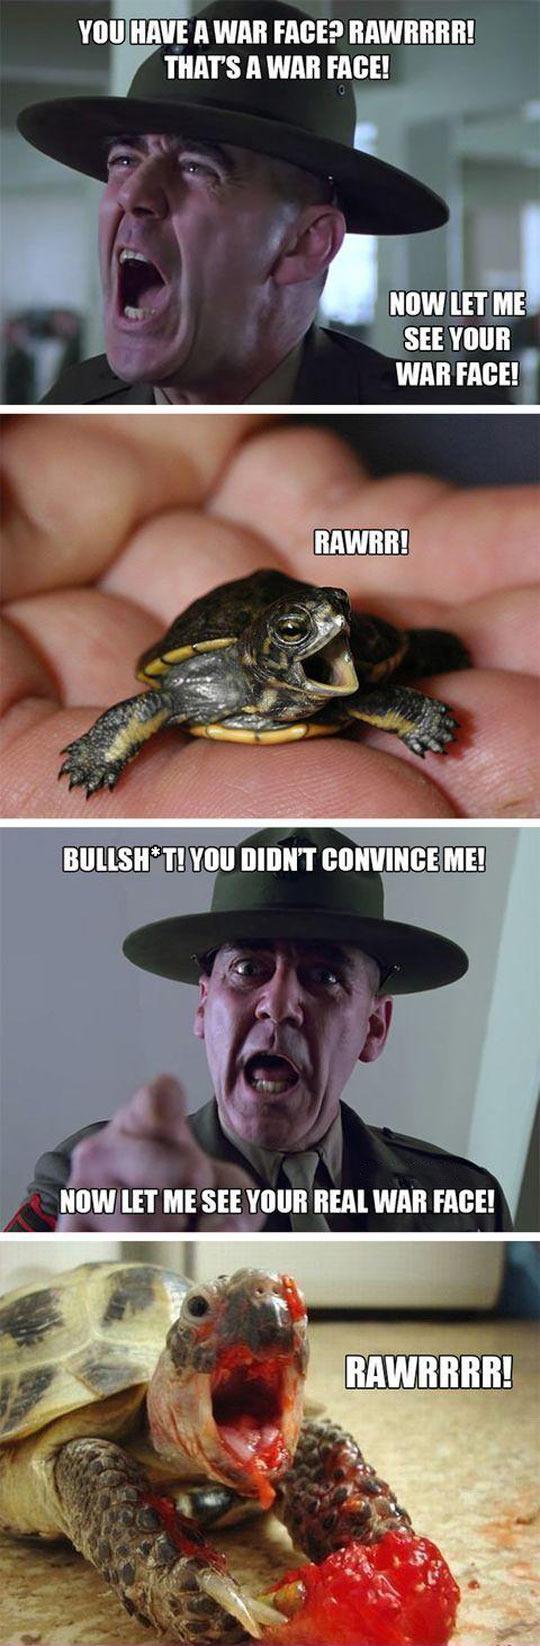 funny-war-face-turtle-fruit